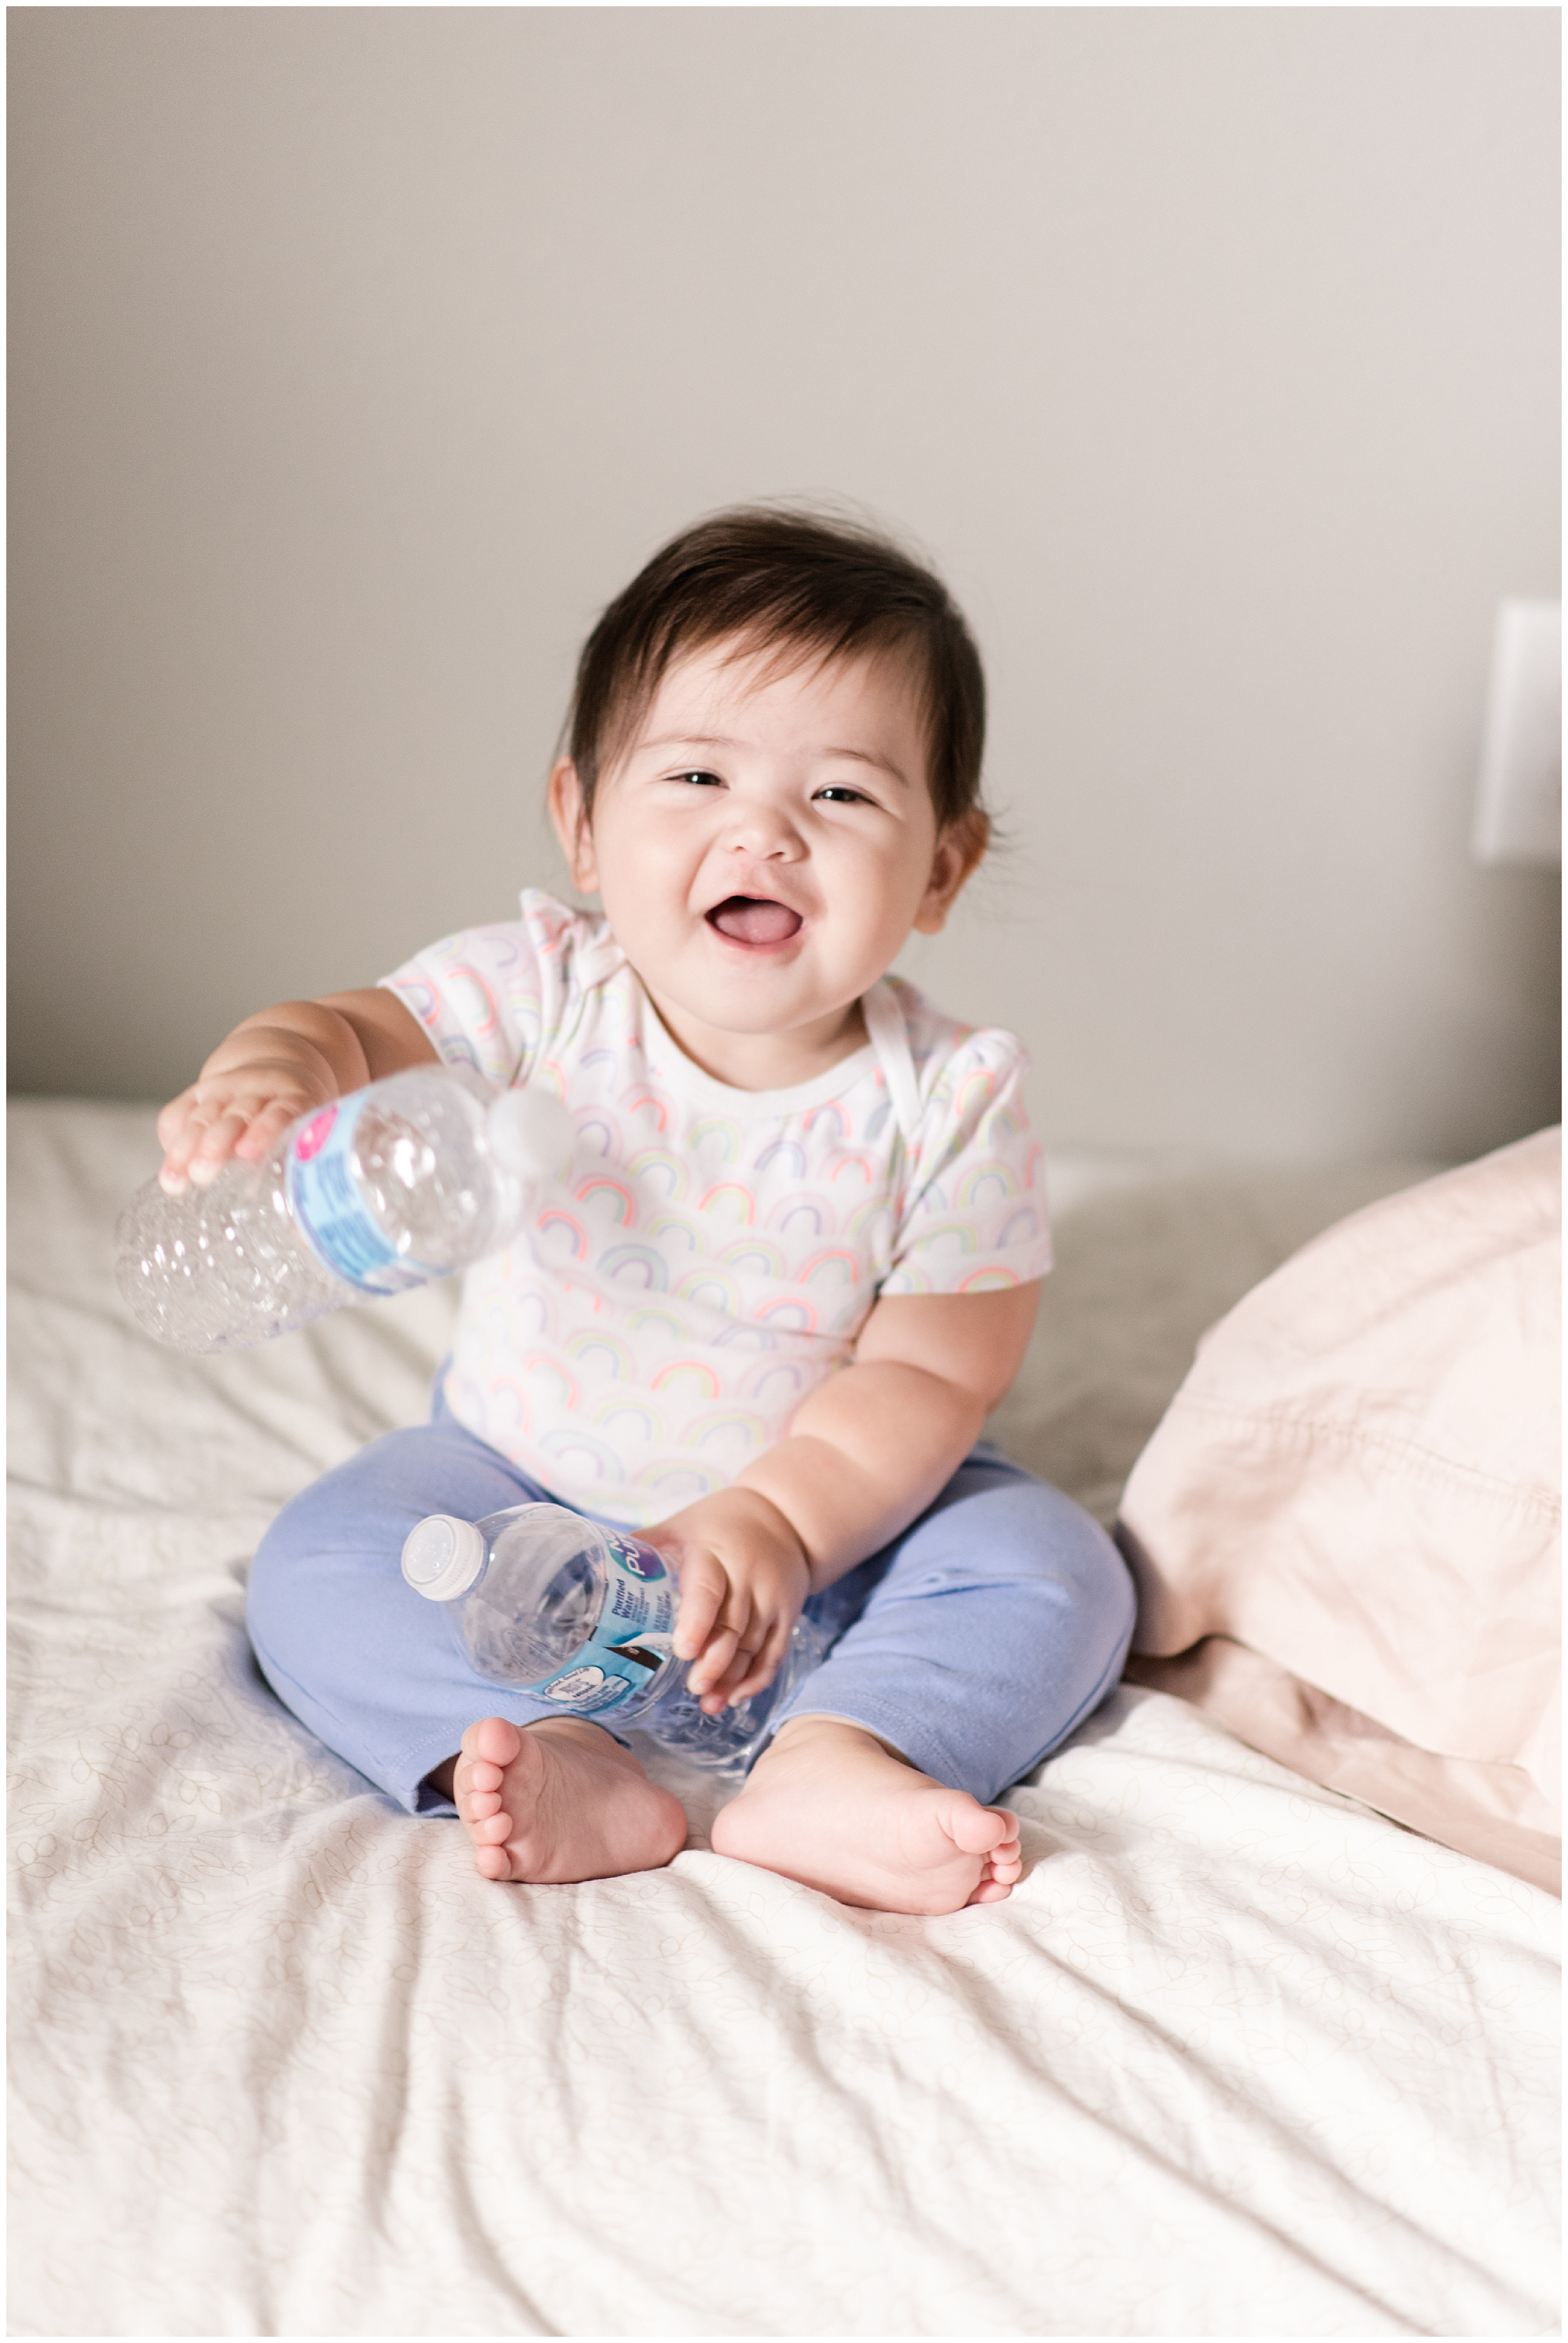 milwaukee-mom-photographer-9-month-old-photography_0020.jpg